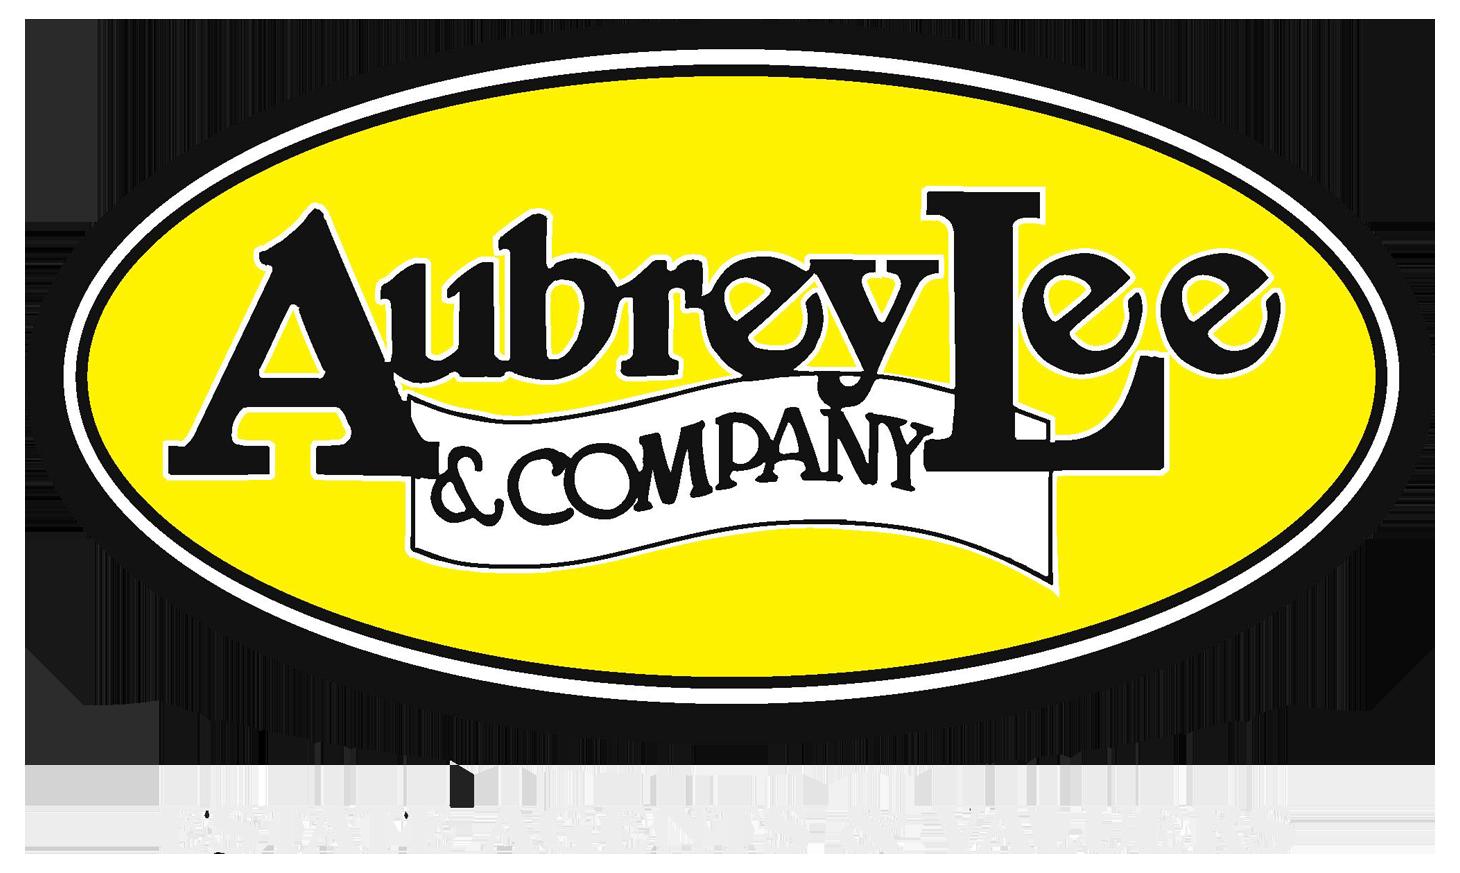 Aubrey Lee